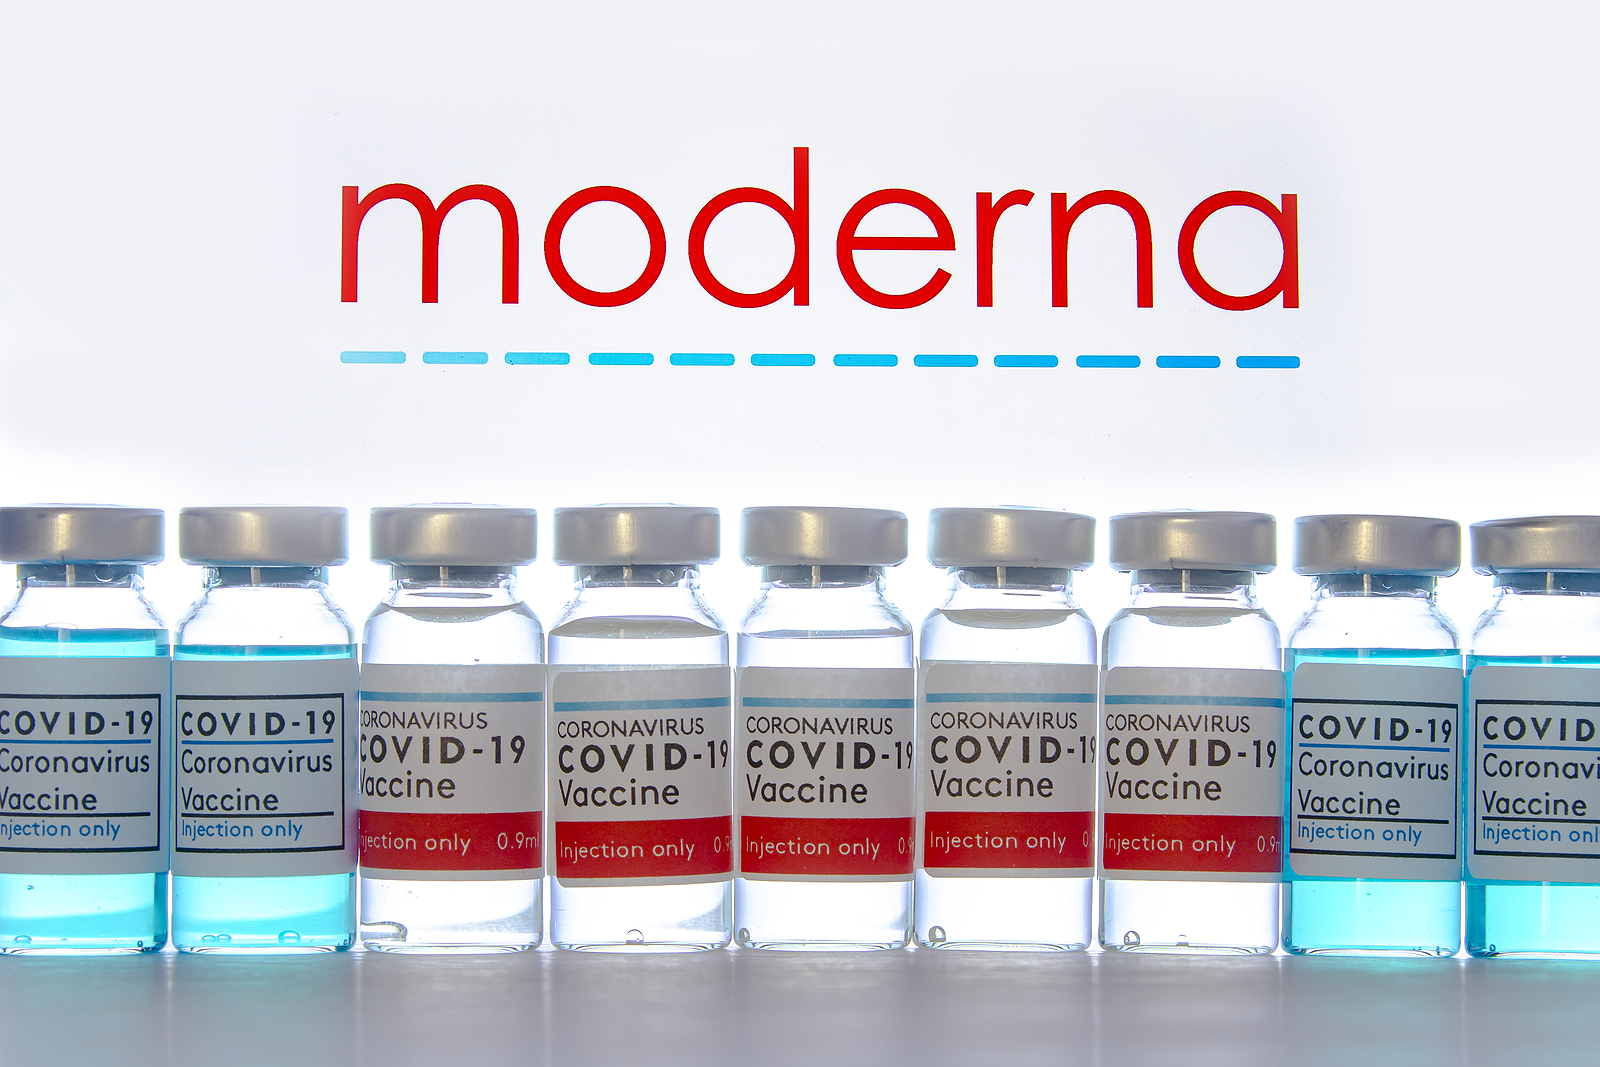 Moderna stock, MRNA stock news and analysis